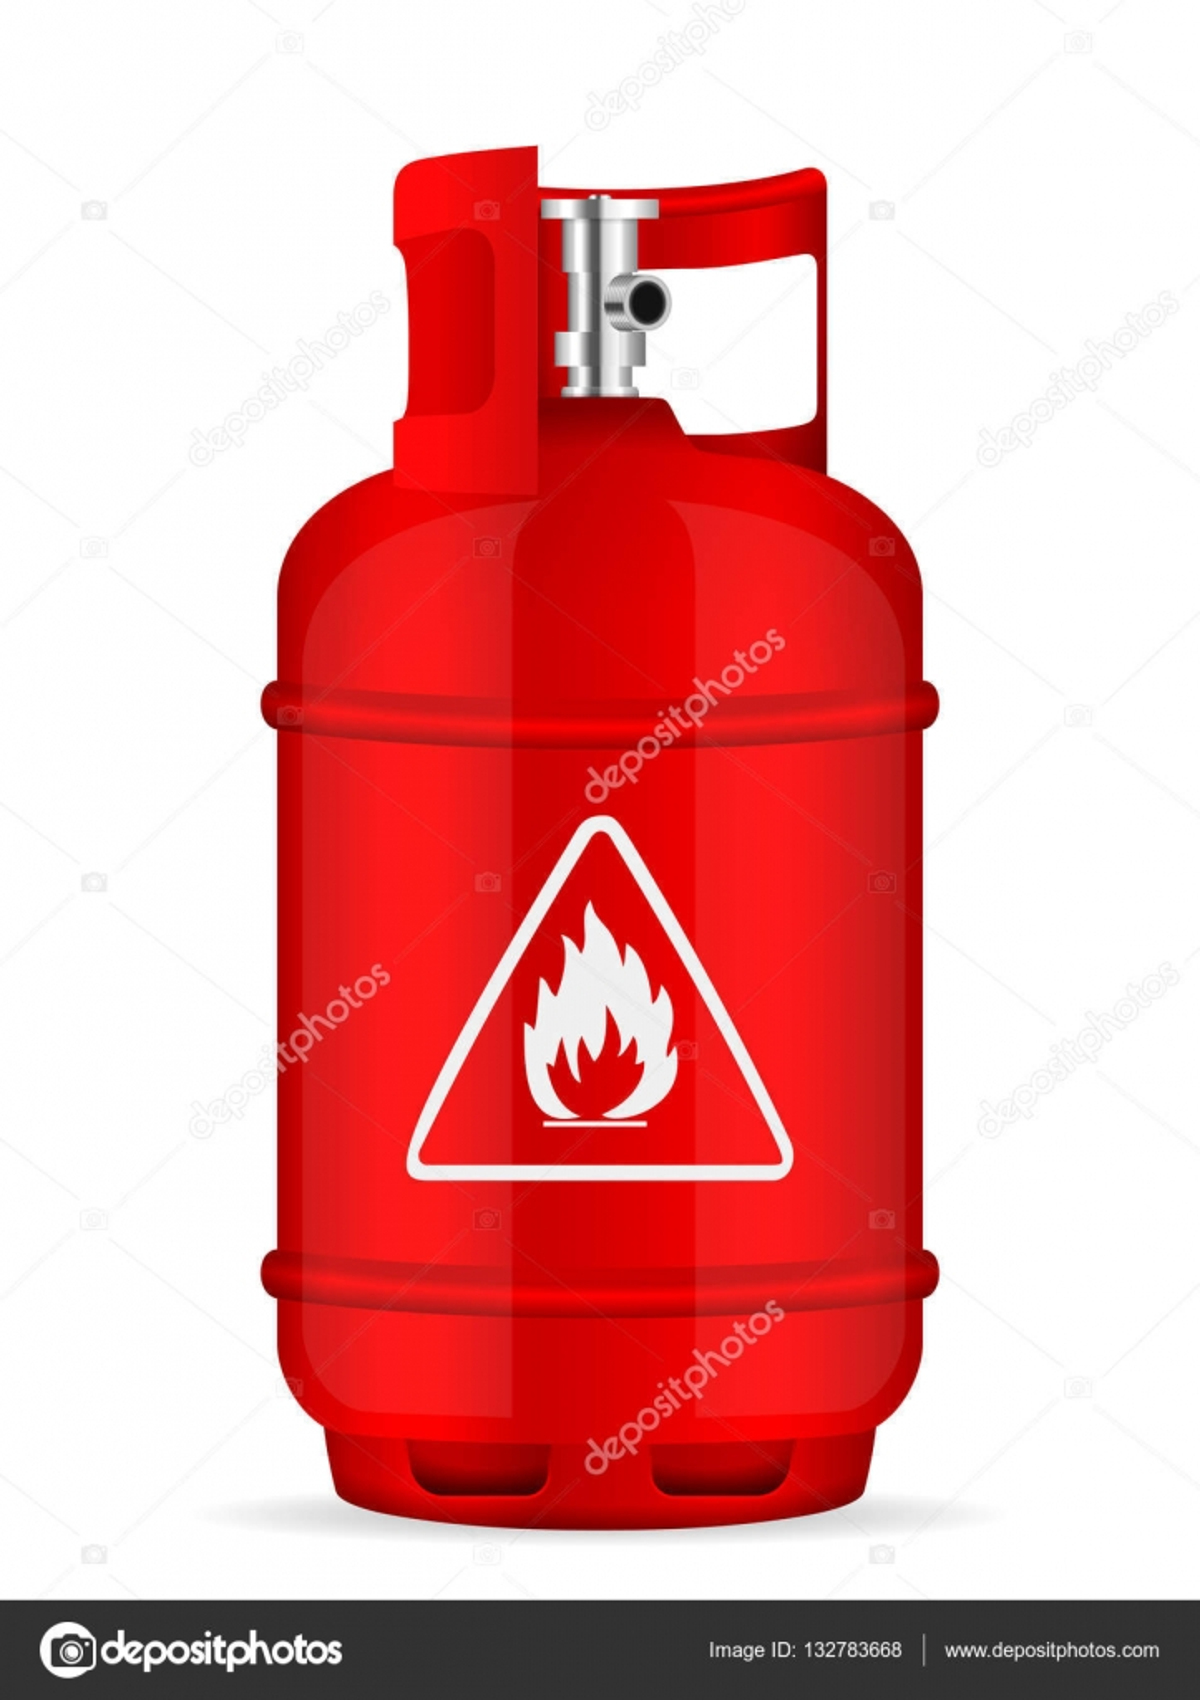 Cilindro de g s propano vetores de stock julydfg for Valor cilindro de gas